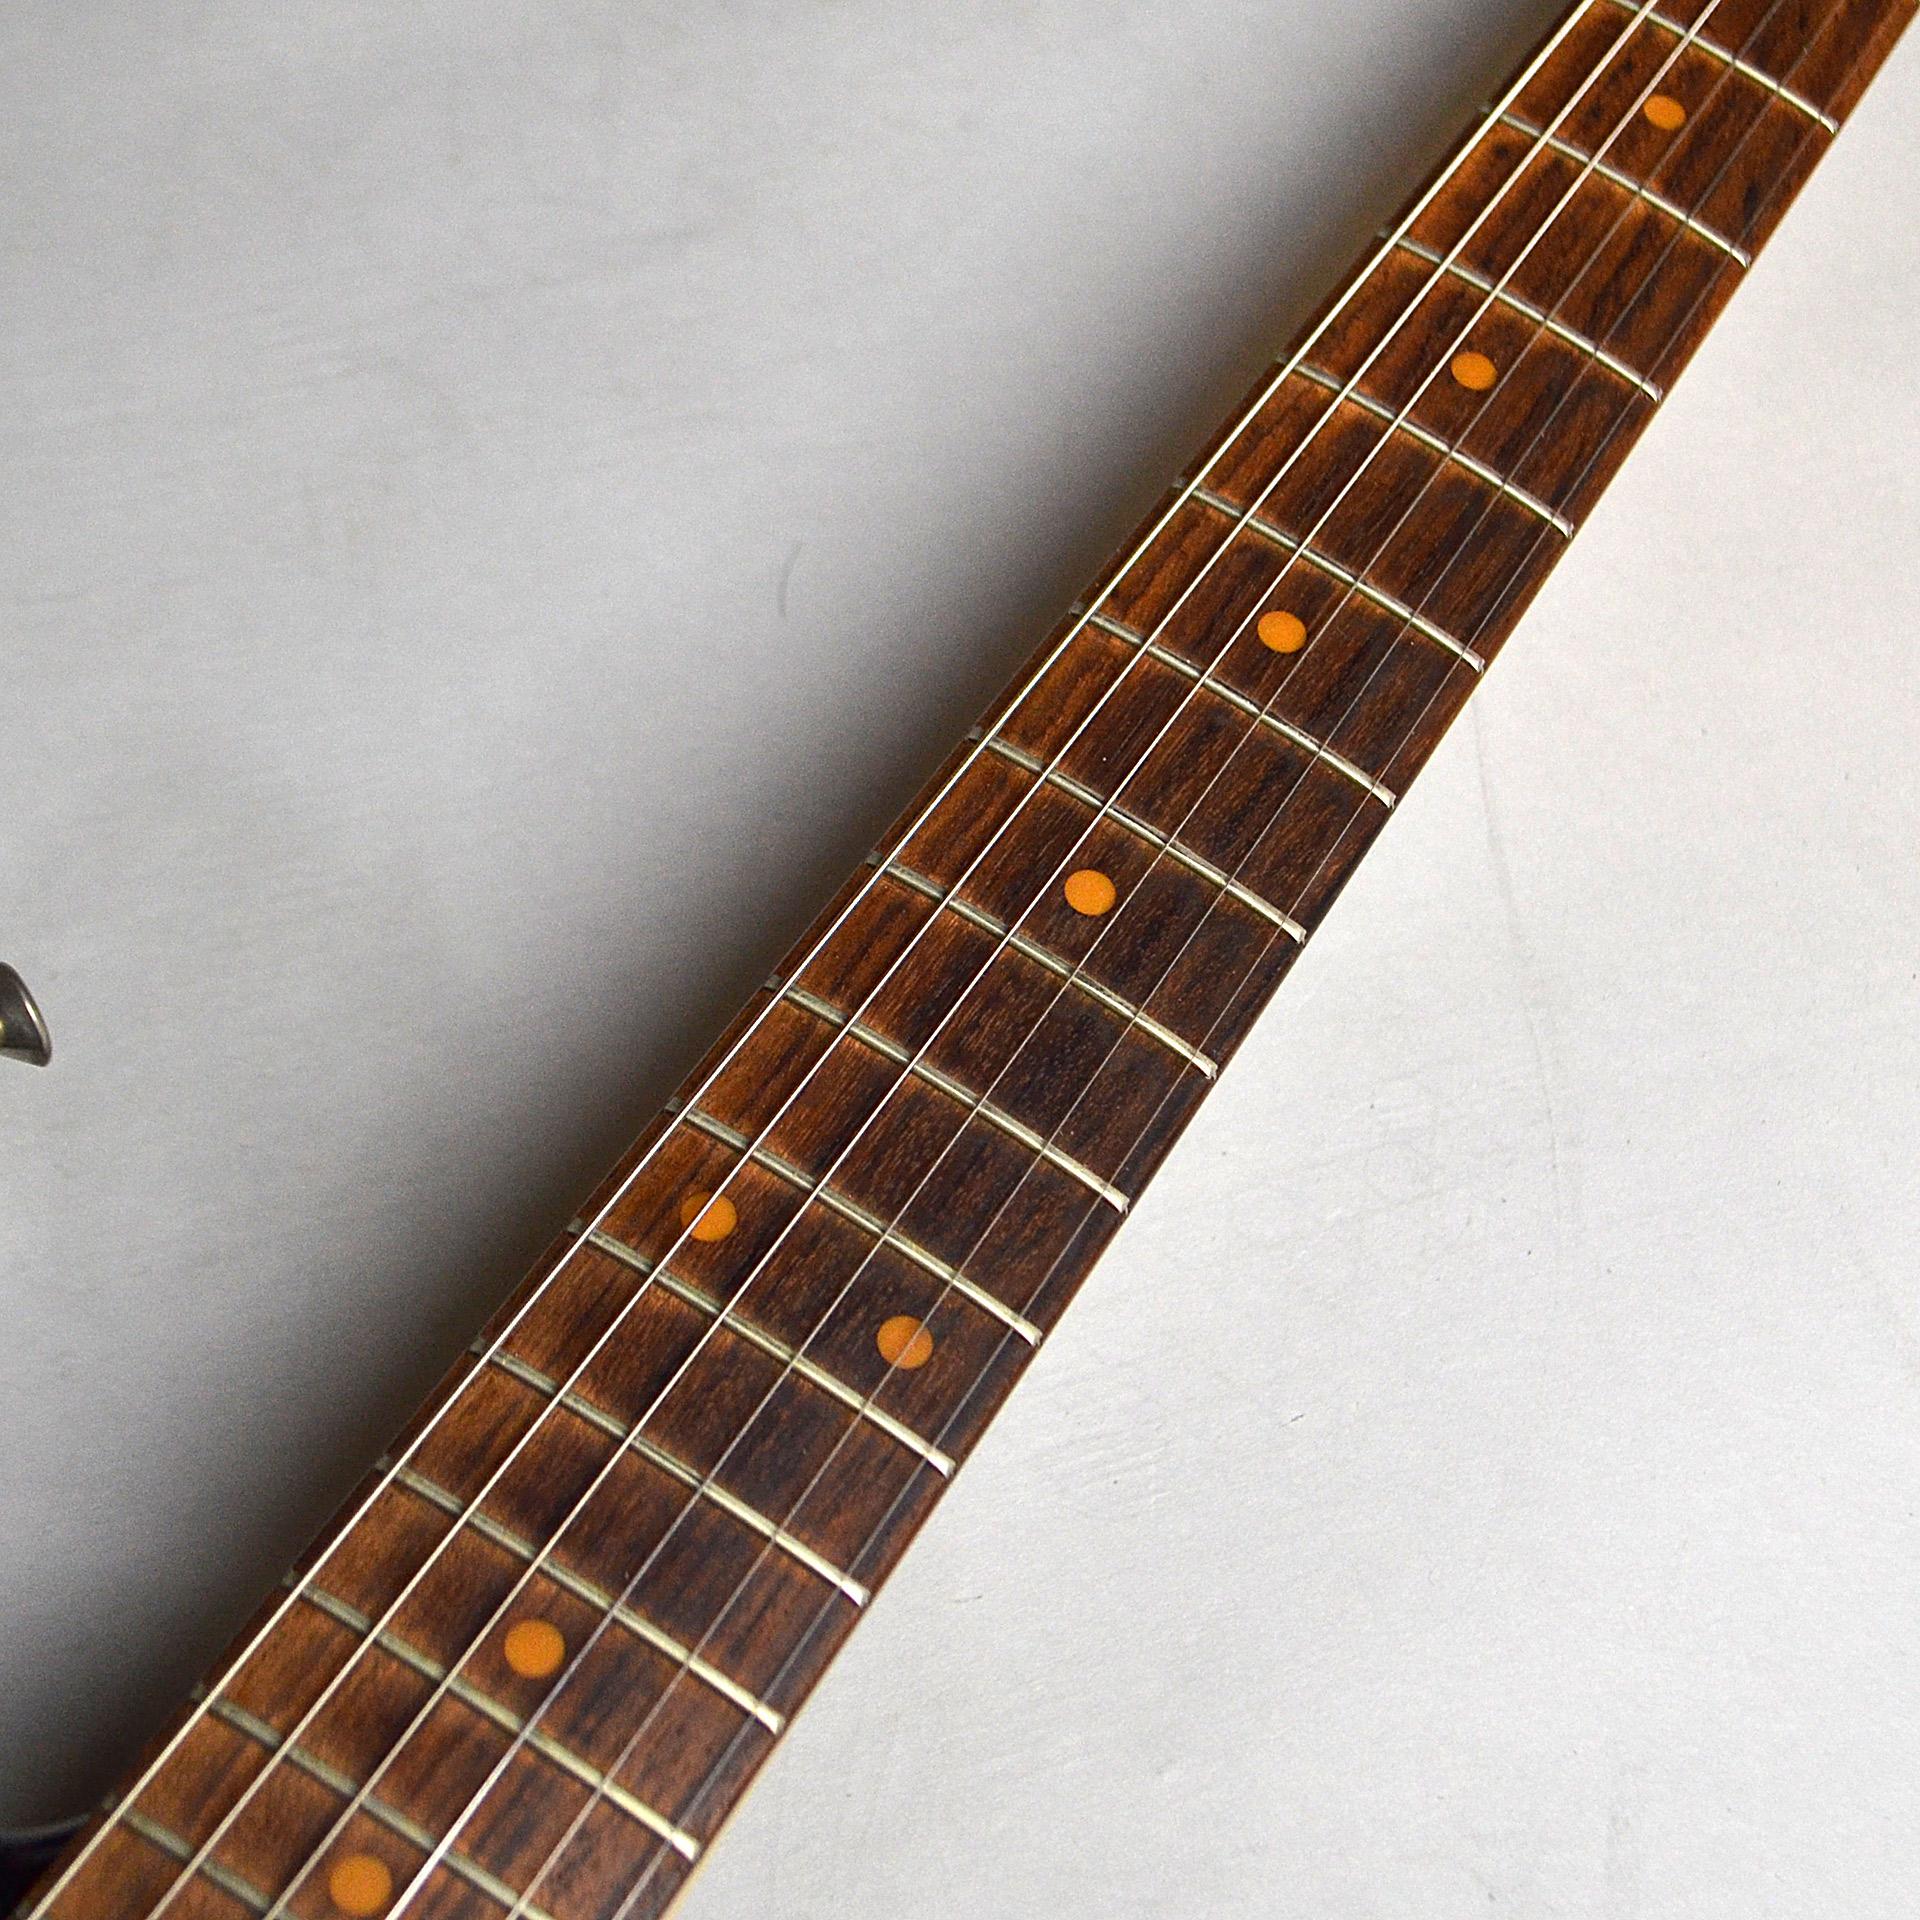 American Vintage 59 Stratocasterの全体画像(縦)